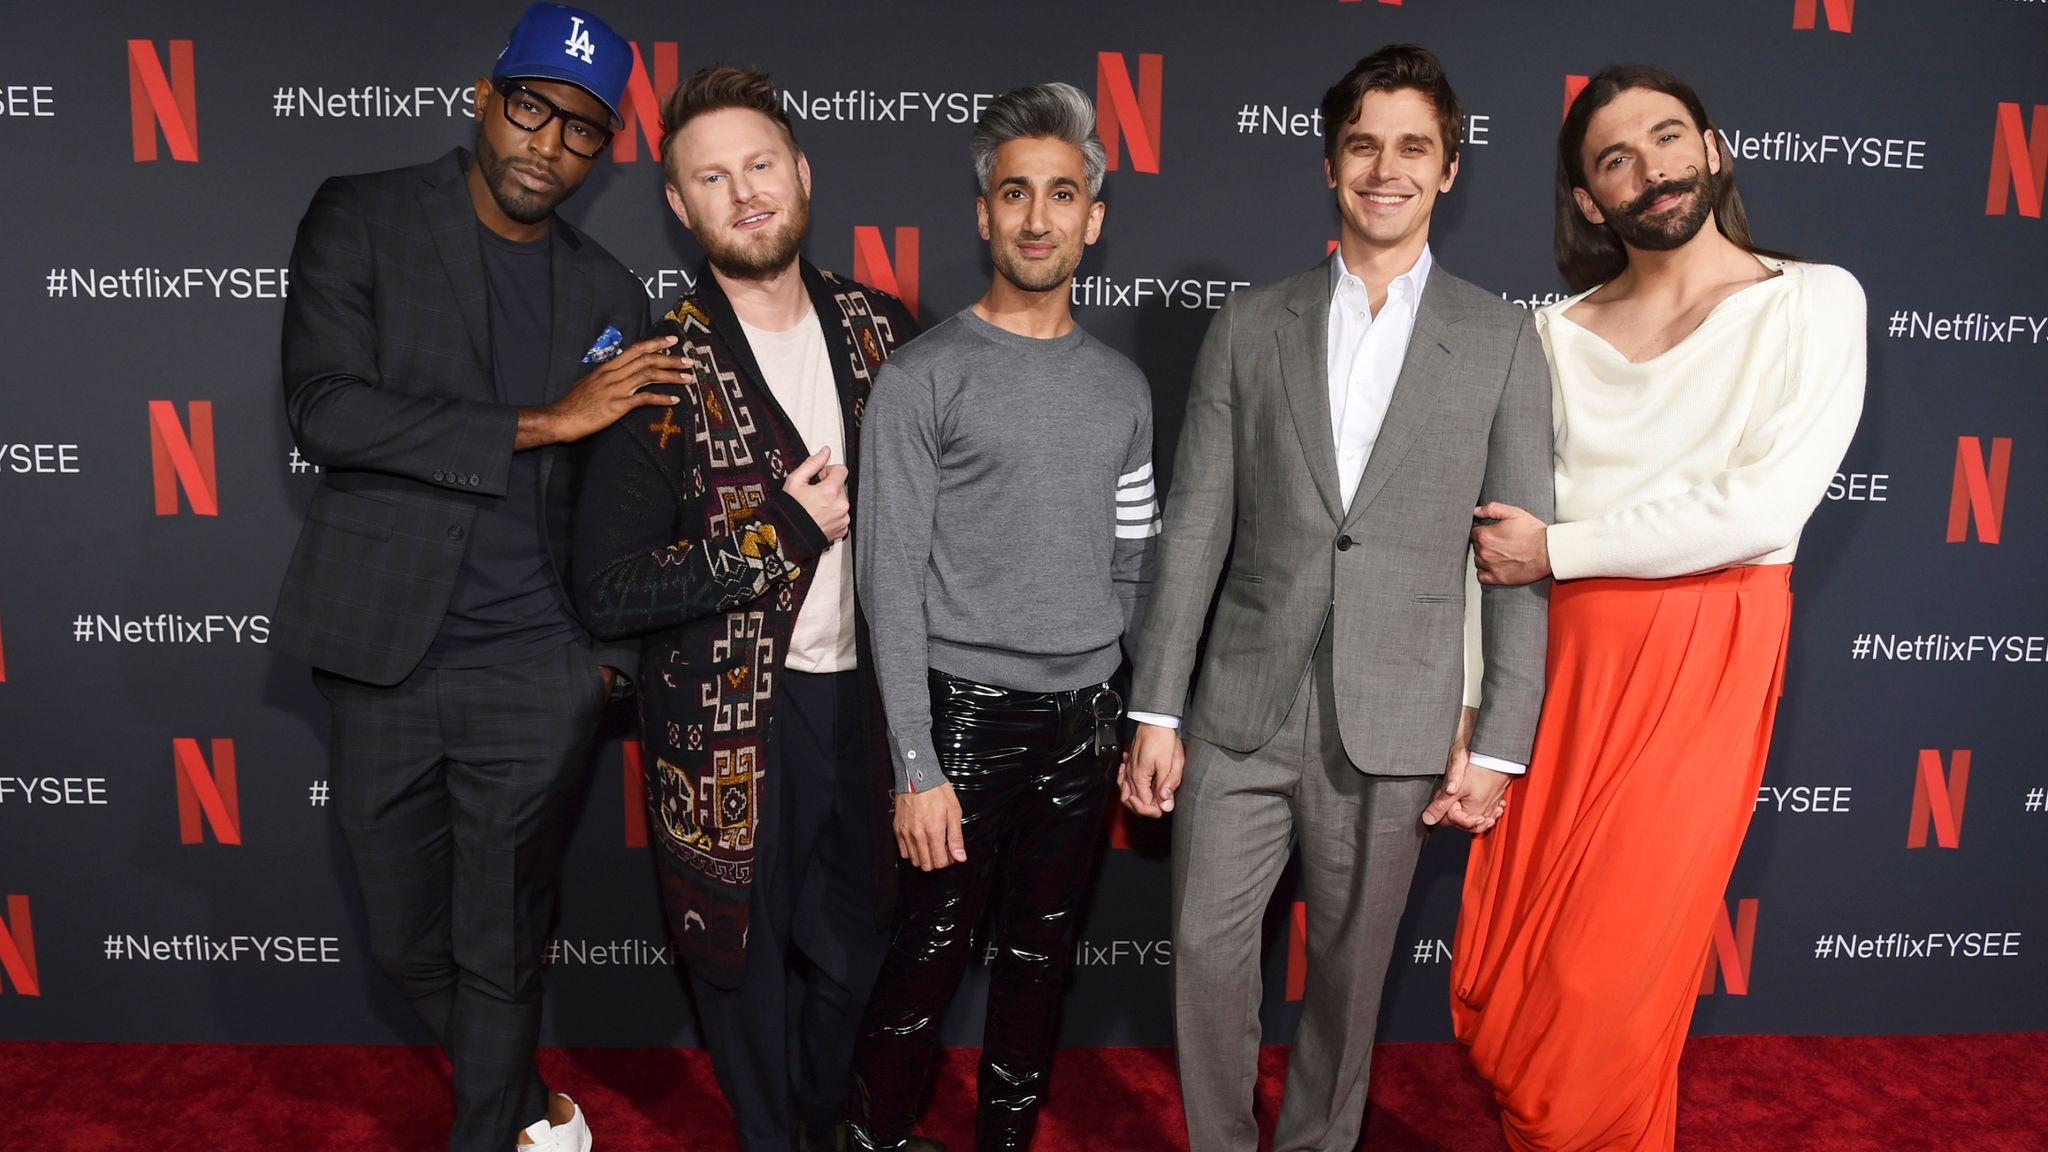 Karamo Brown, Bobby Berk, Tan France, Antoni Porowski and Jonathan Van Ness make up Queer Eye's Fab Five. Pic: Chris Pizzello/Invision via AP